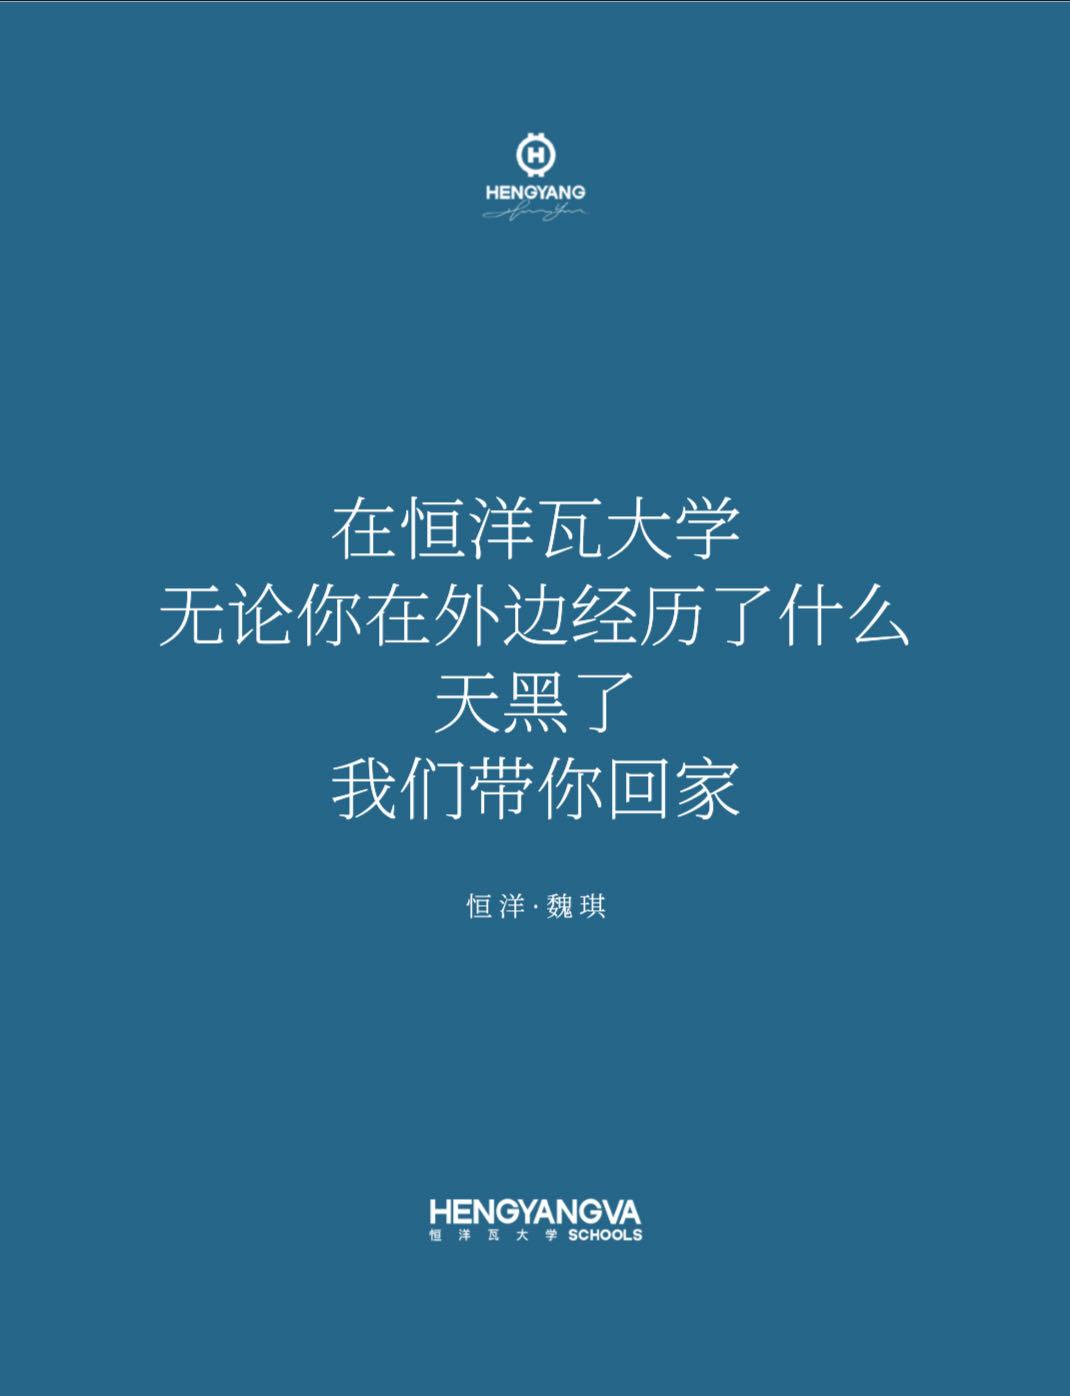 HENGYANGVA大学介绍